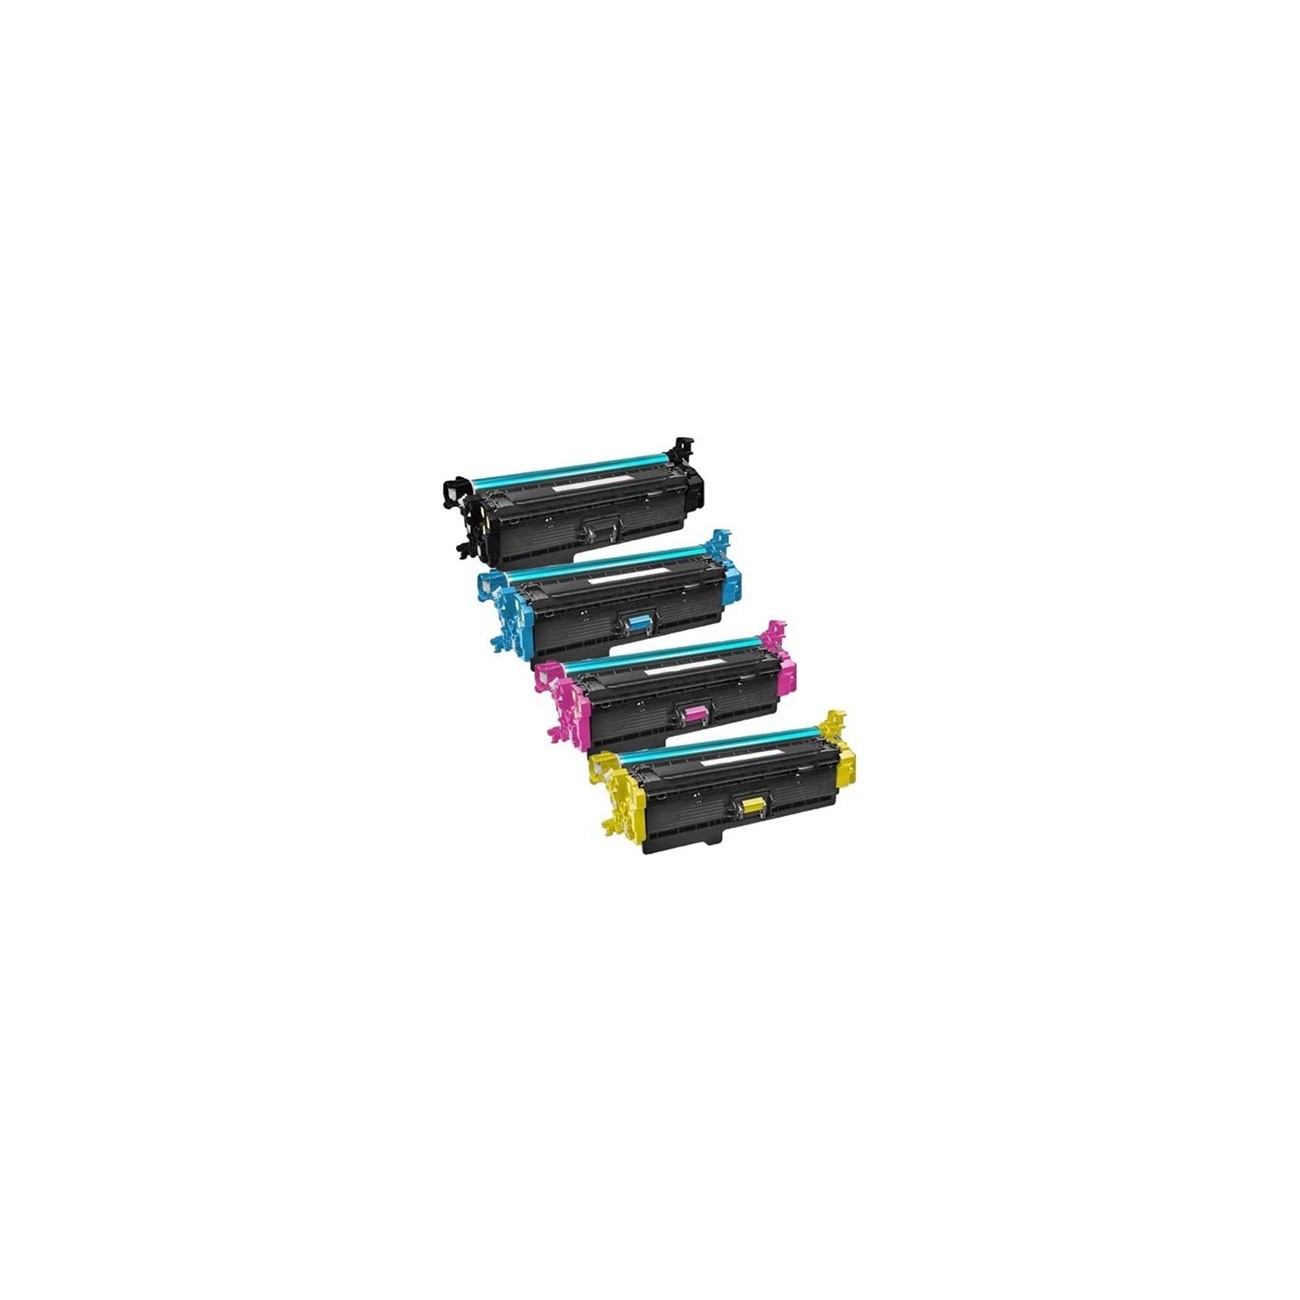 Cassettiera 3 cassetti LIGHT